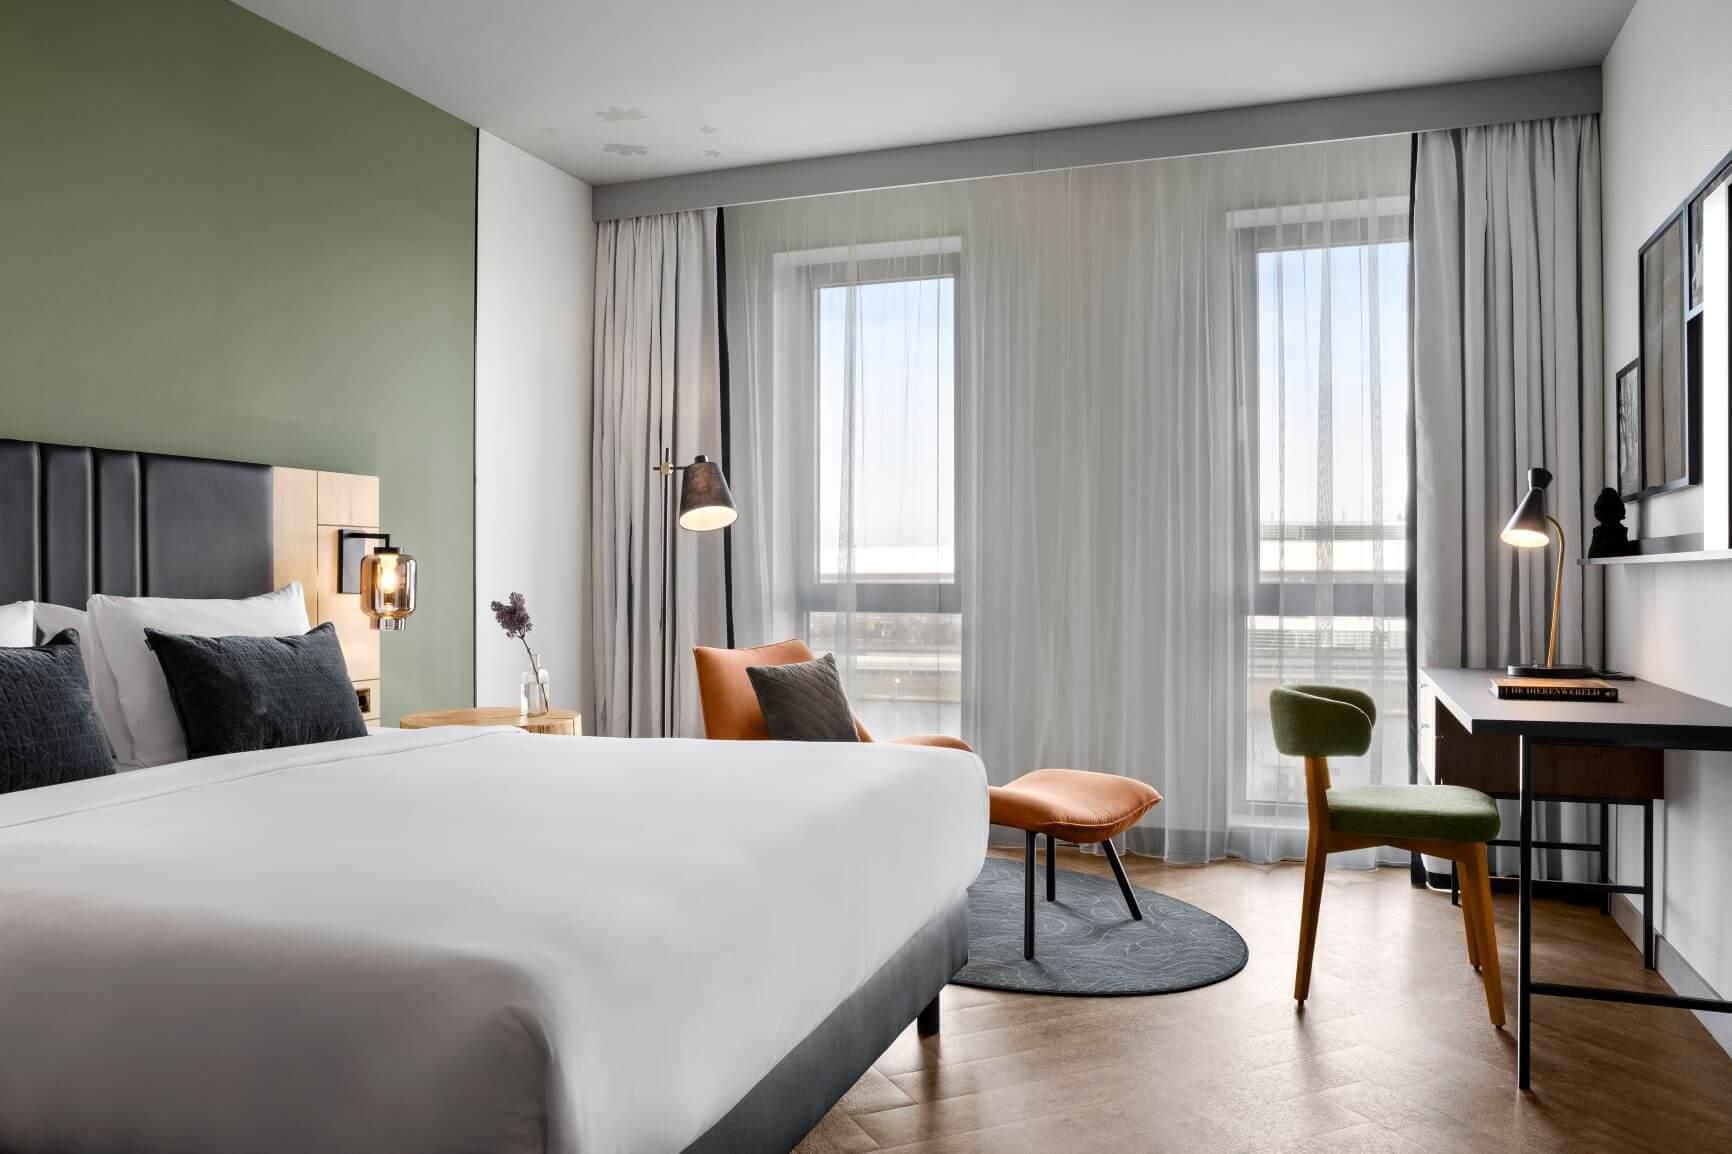 Renaissance Hotel Amsterdam Schiphol Aalsmeer